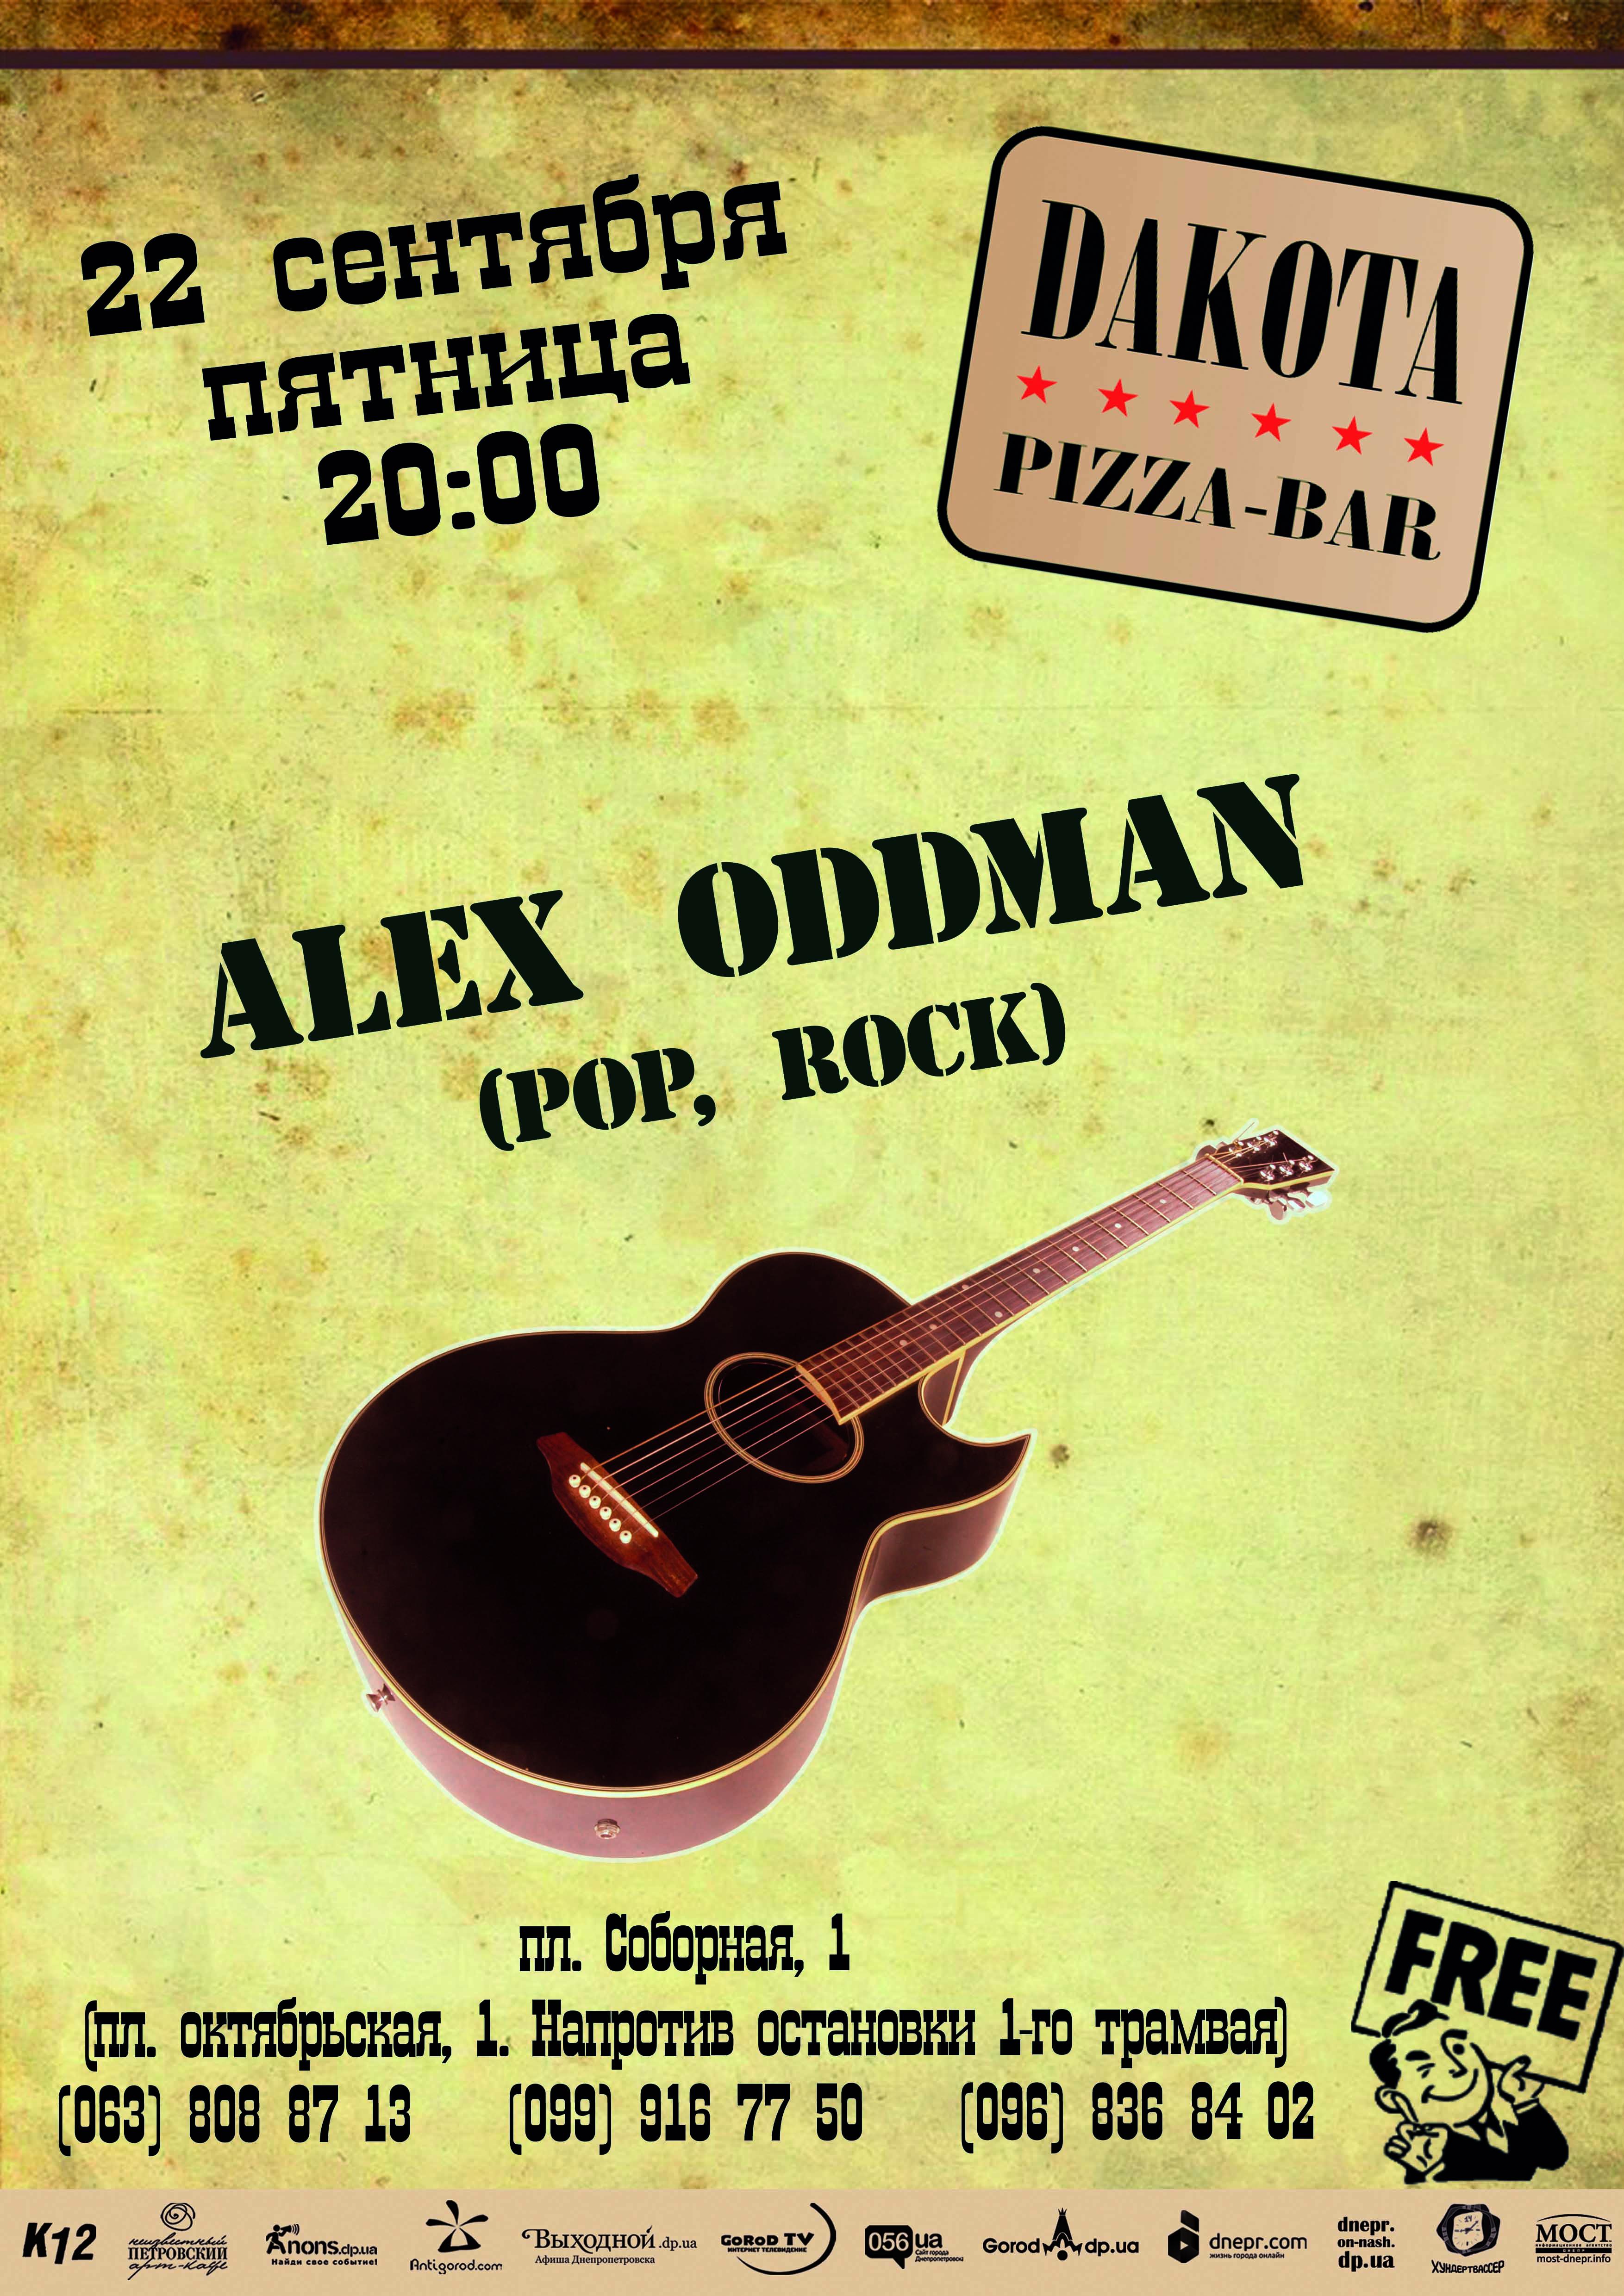 220917AlexOddman